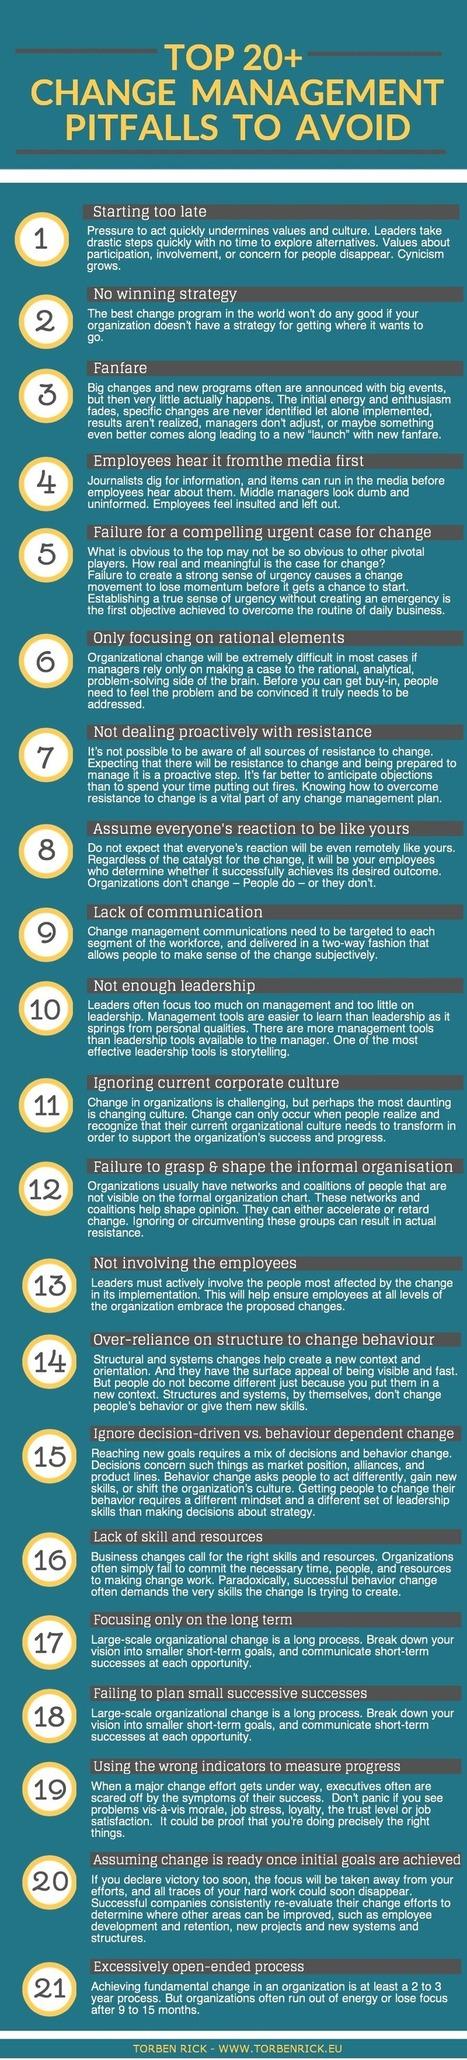 Infographic: Top 20+ organizational change management pitfalls | Leading change | Scoop.it